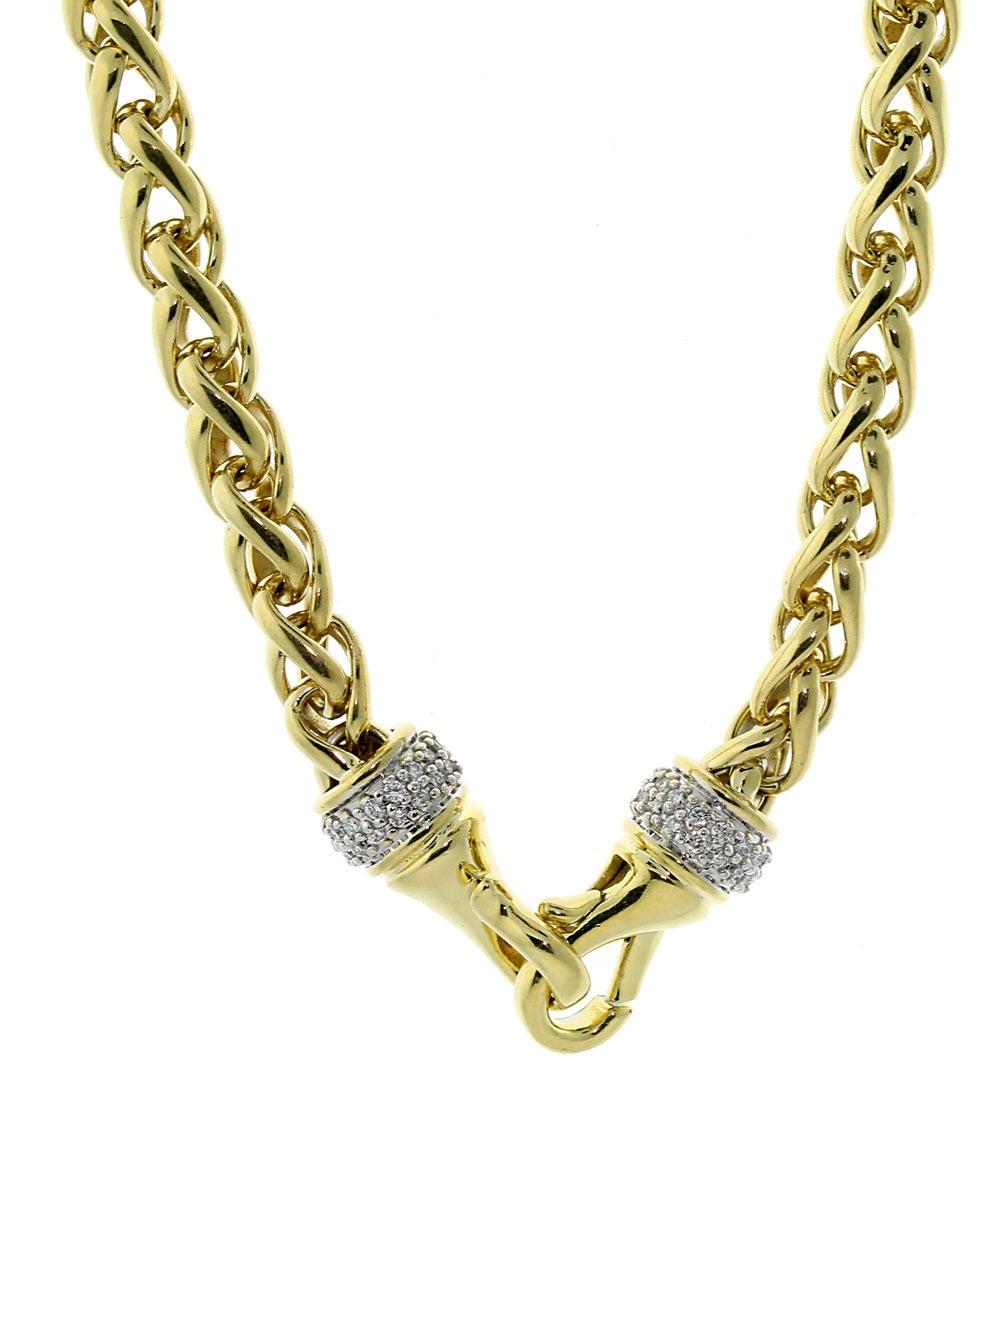 david yurman gold wheat necklace at 1stdibs